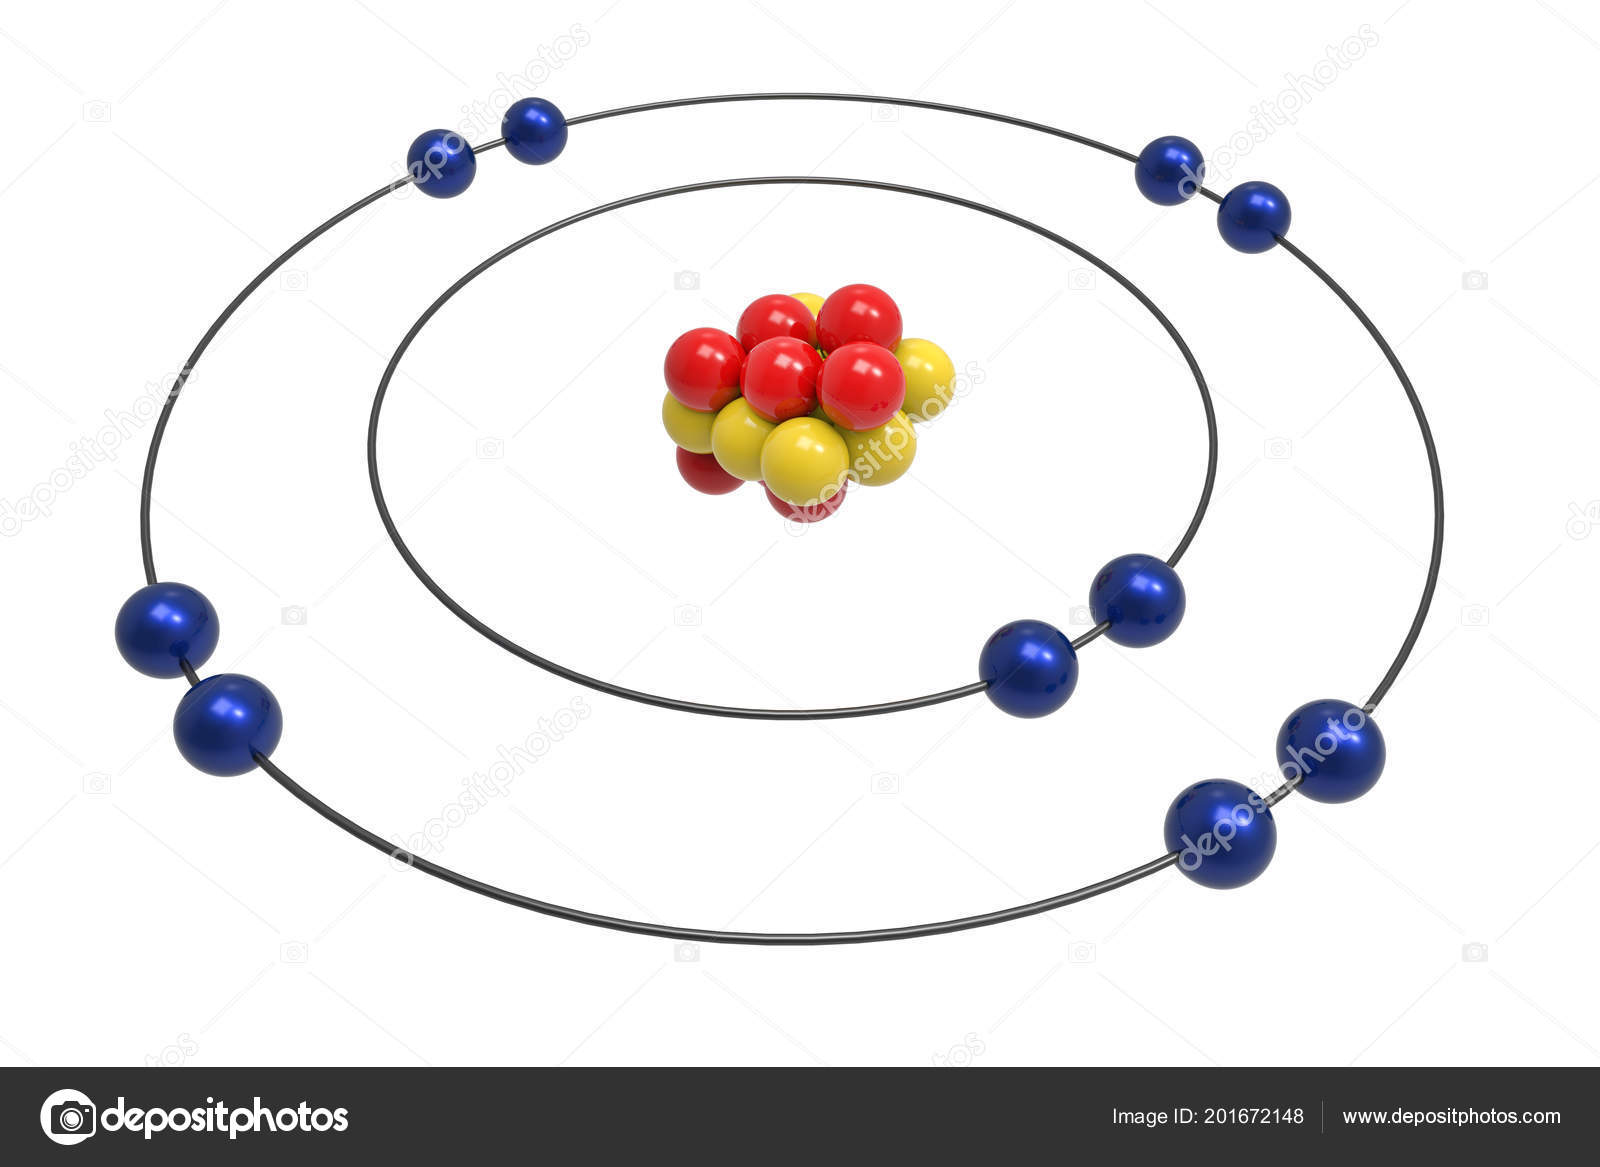 neon atom diagram 2002 pt cruiser wiring bohr model proton neutron electron science chemical concept stock photo